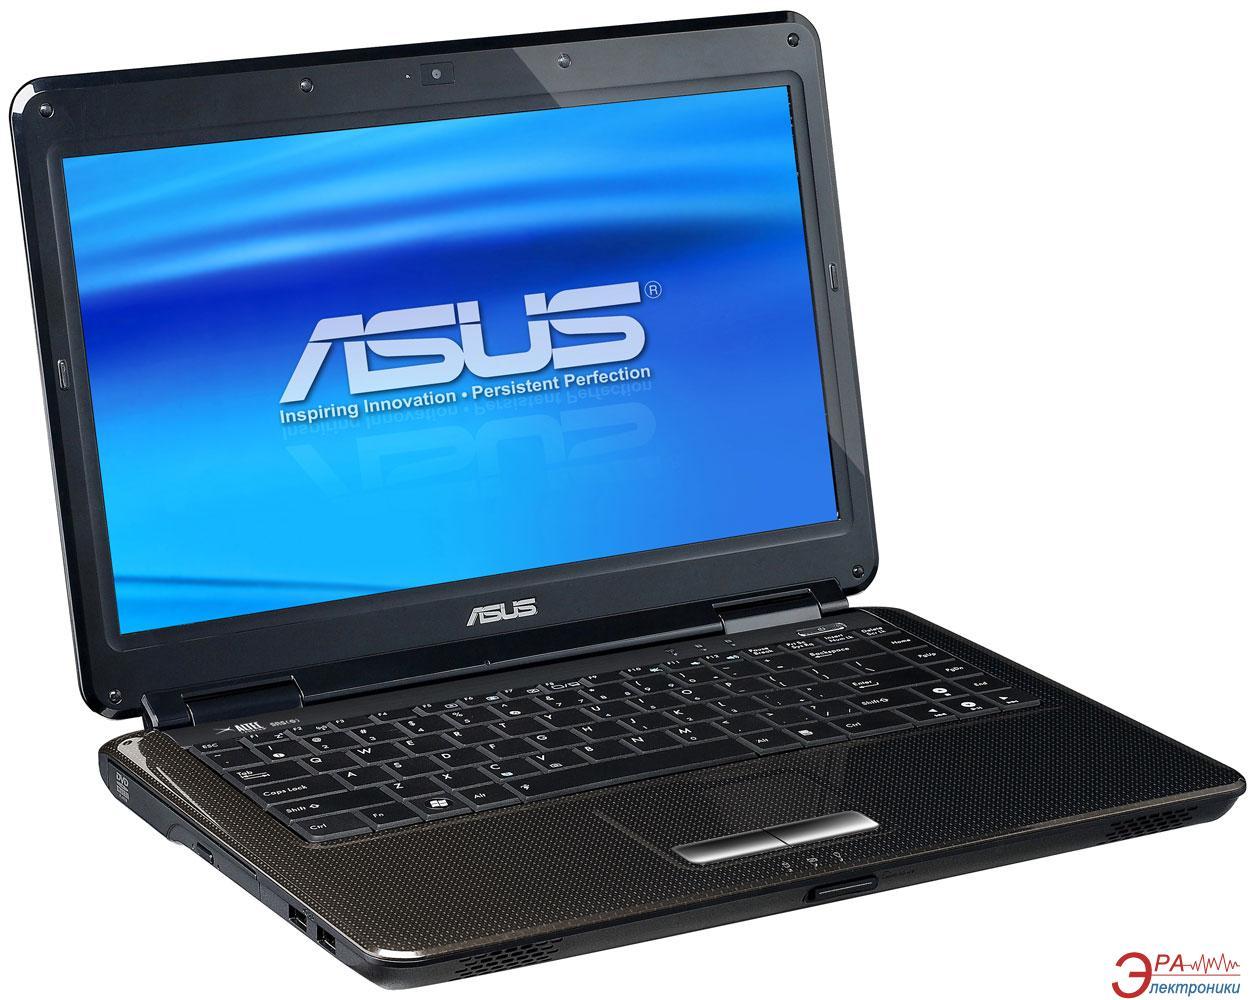 Ноутбук Asus K40AB (K40AB-ZM84SCGDWW) Black 14